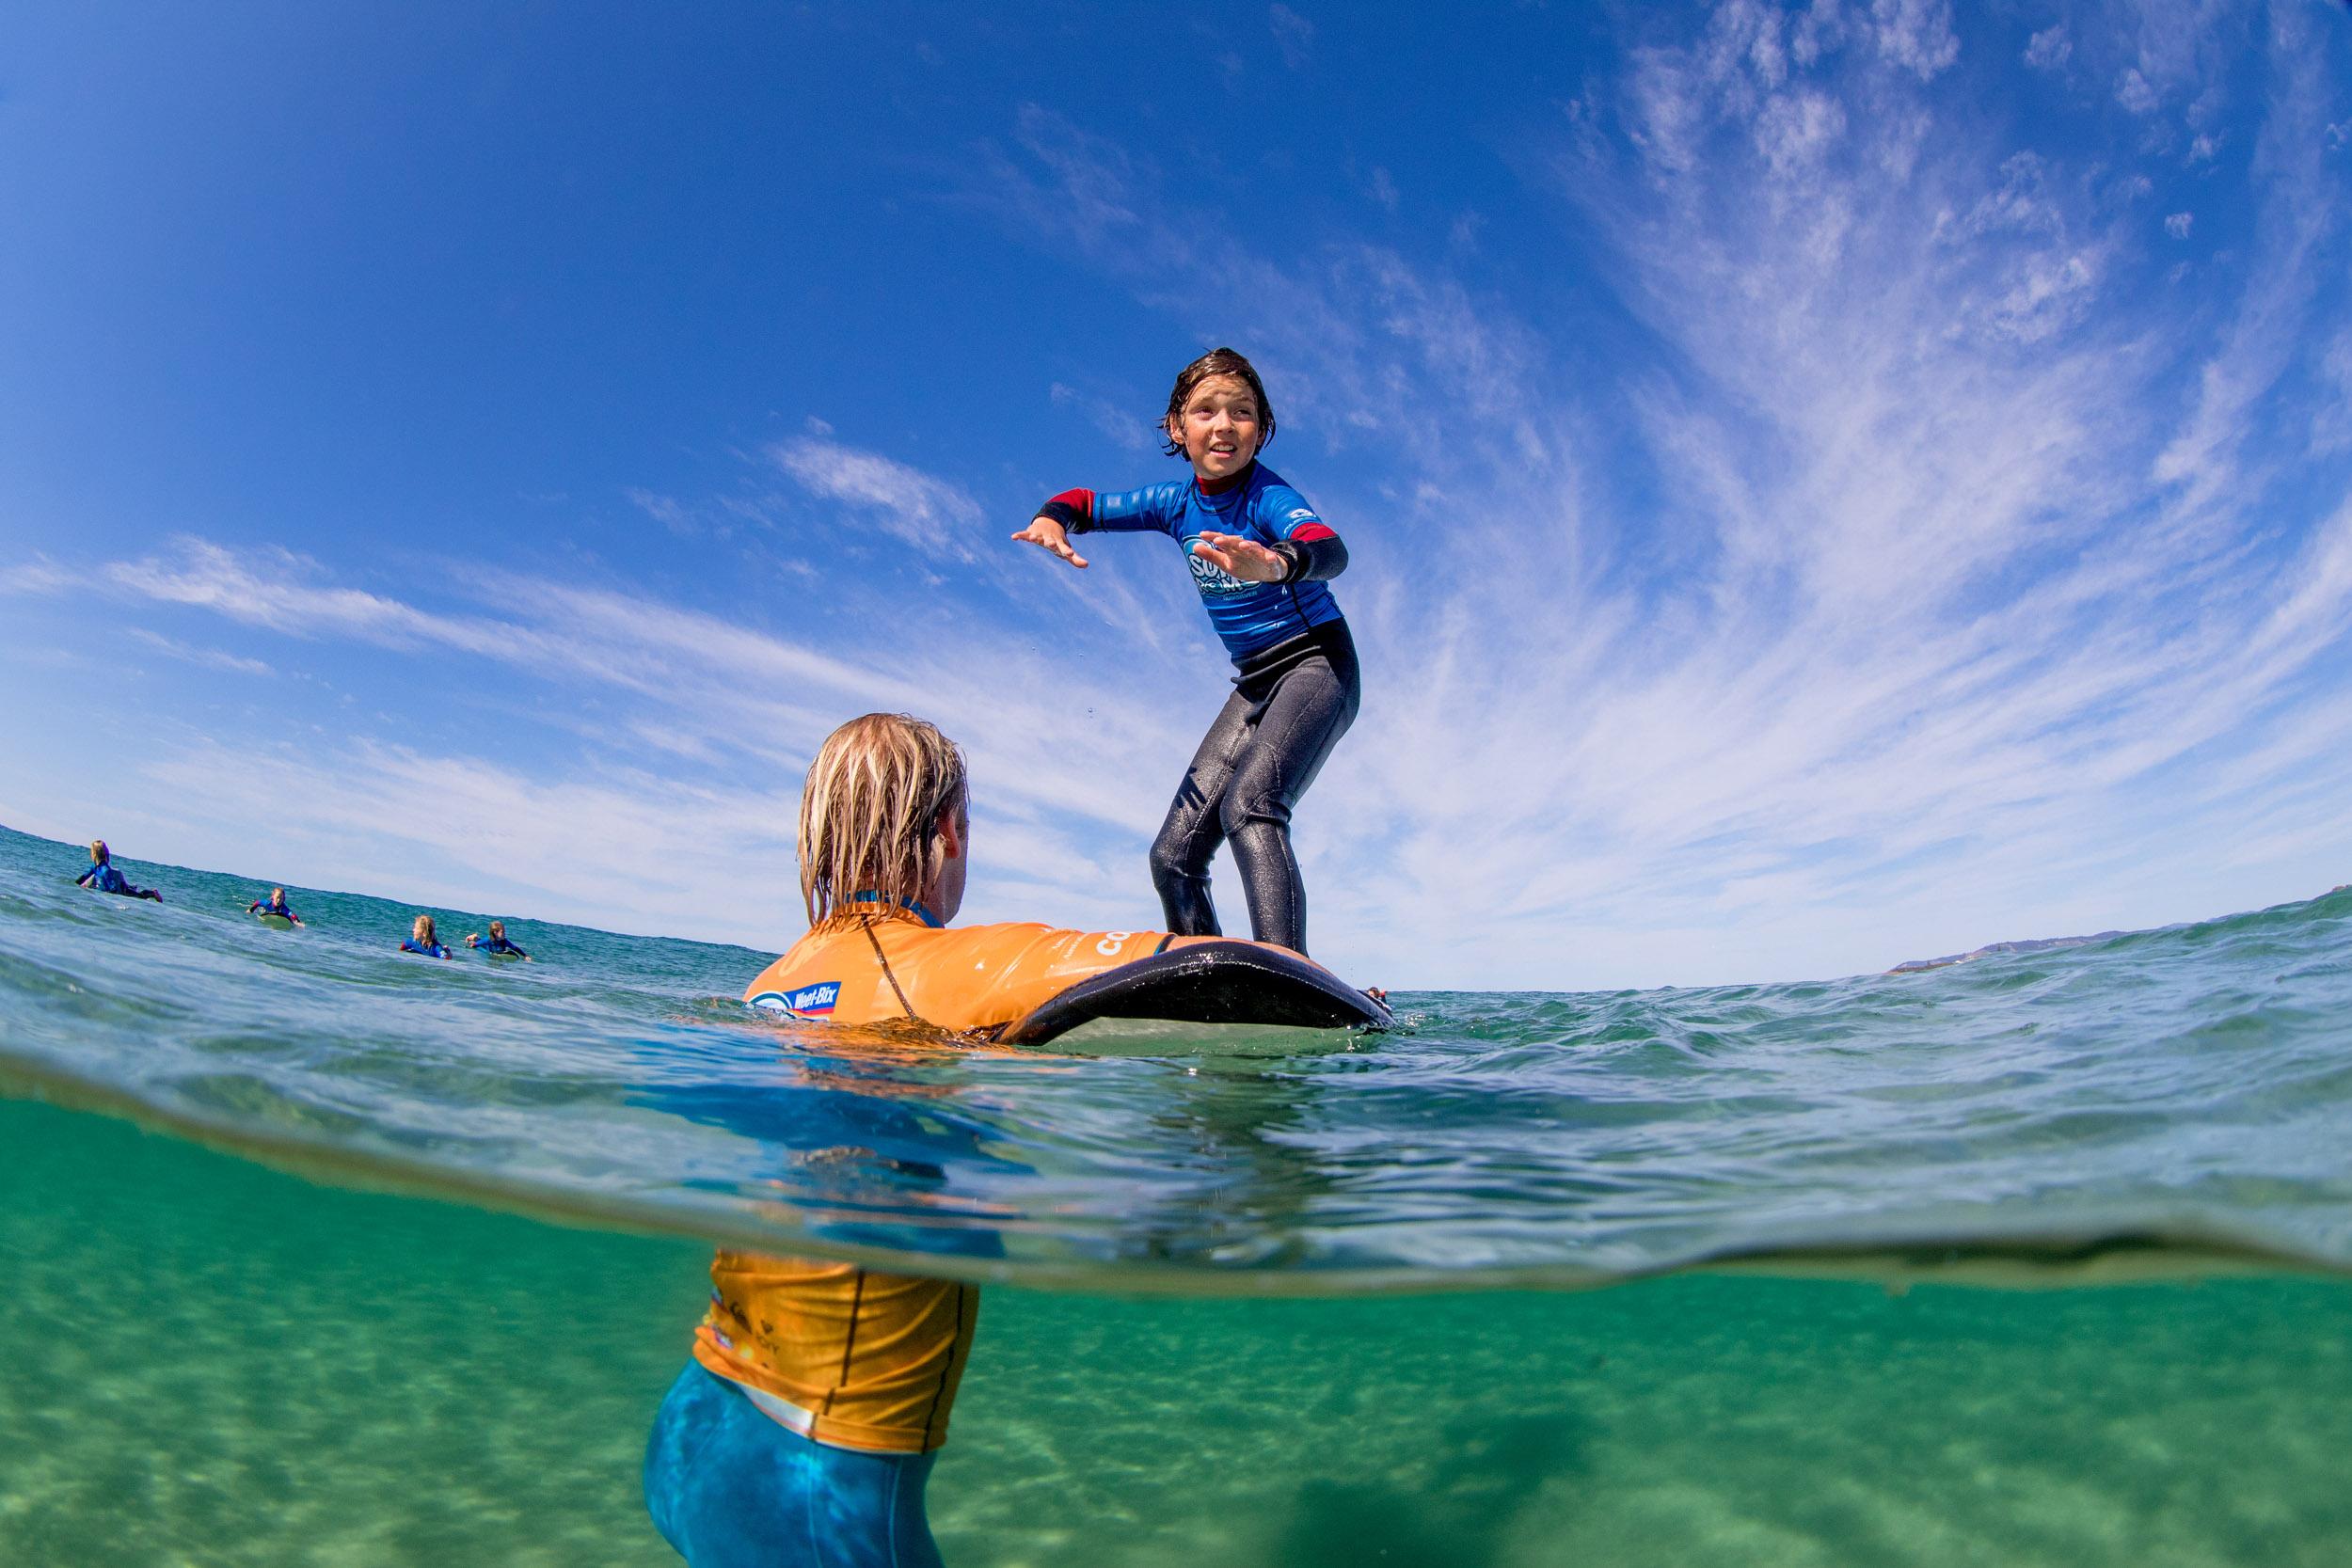 surfing-australia-surf-groms-photography-SGWB-735.jpg